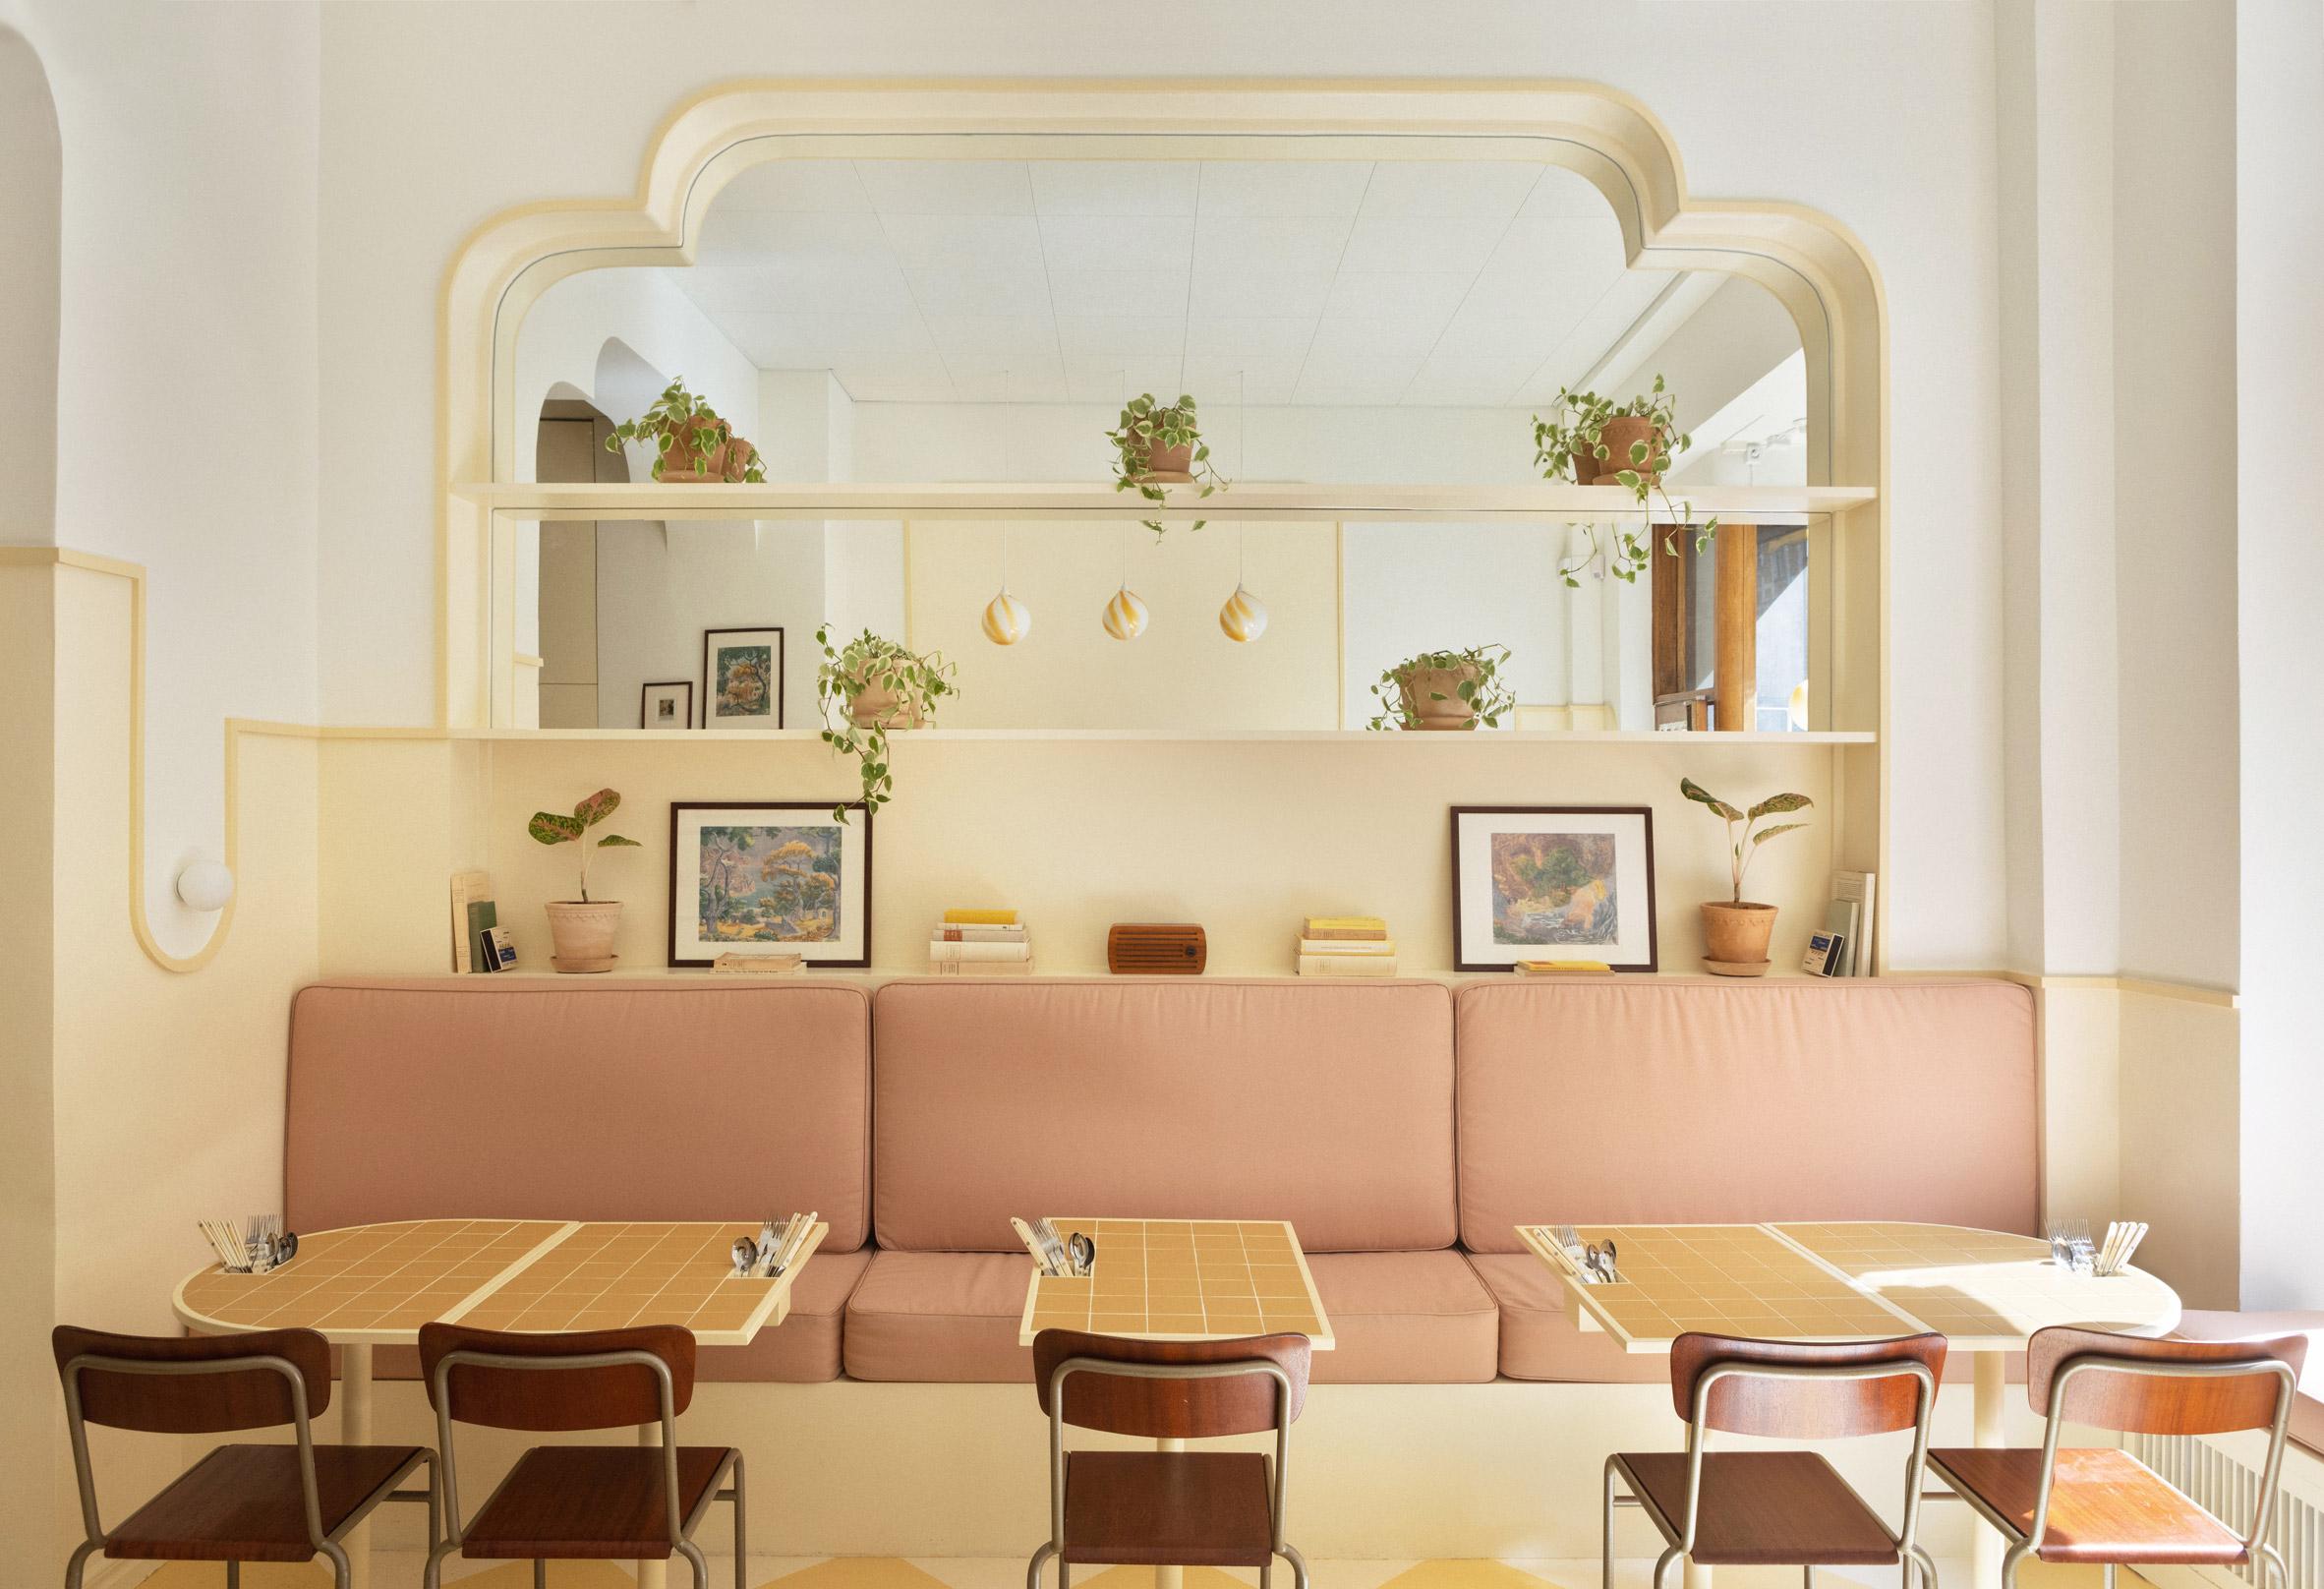 Interior of Cafe Bancado